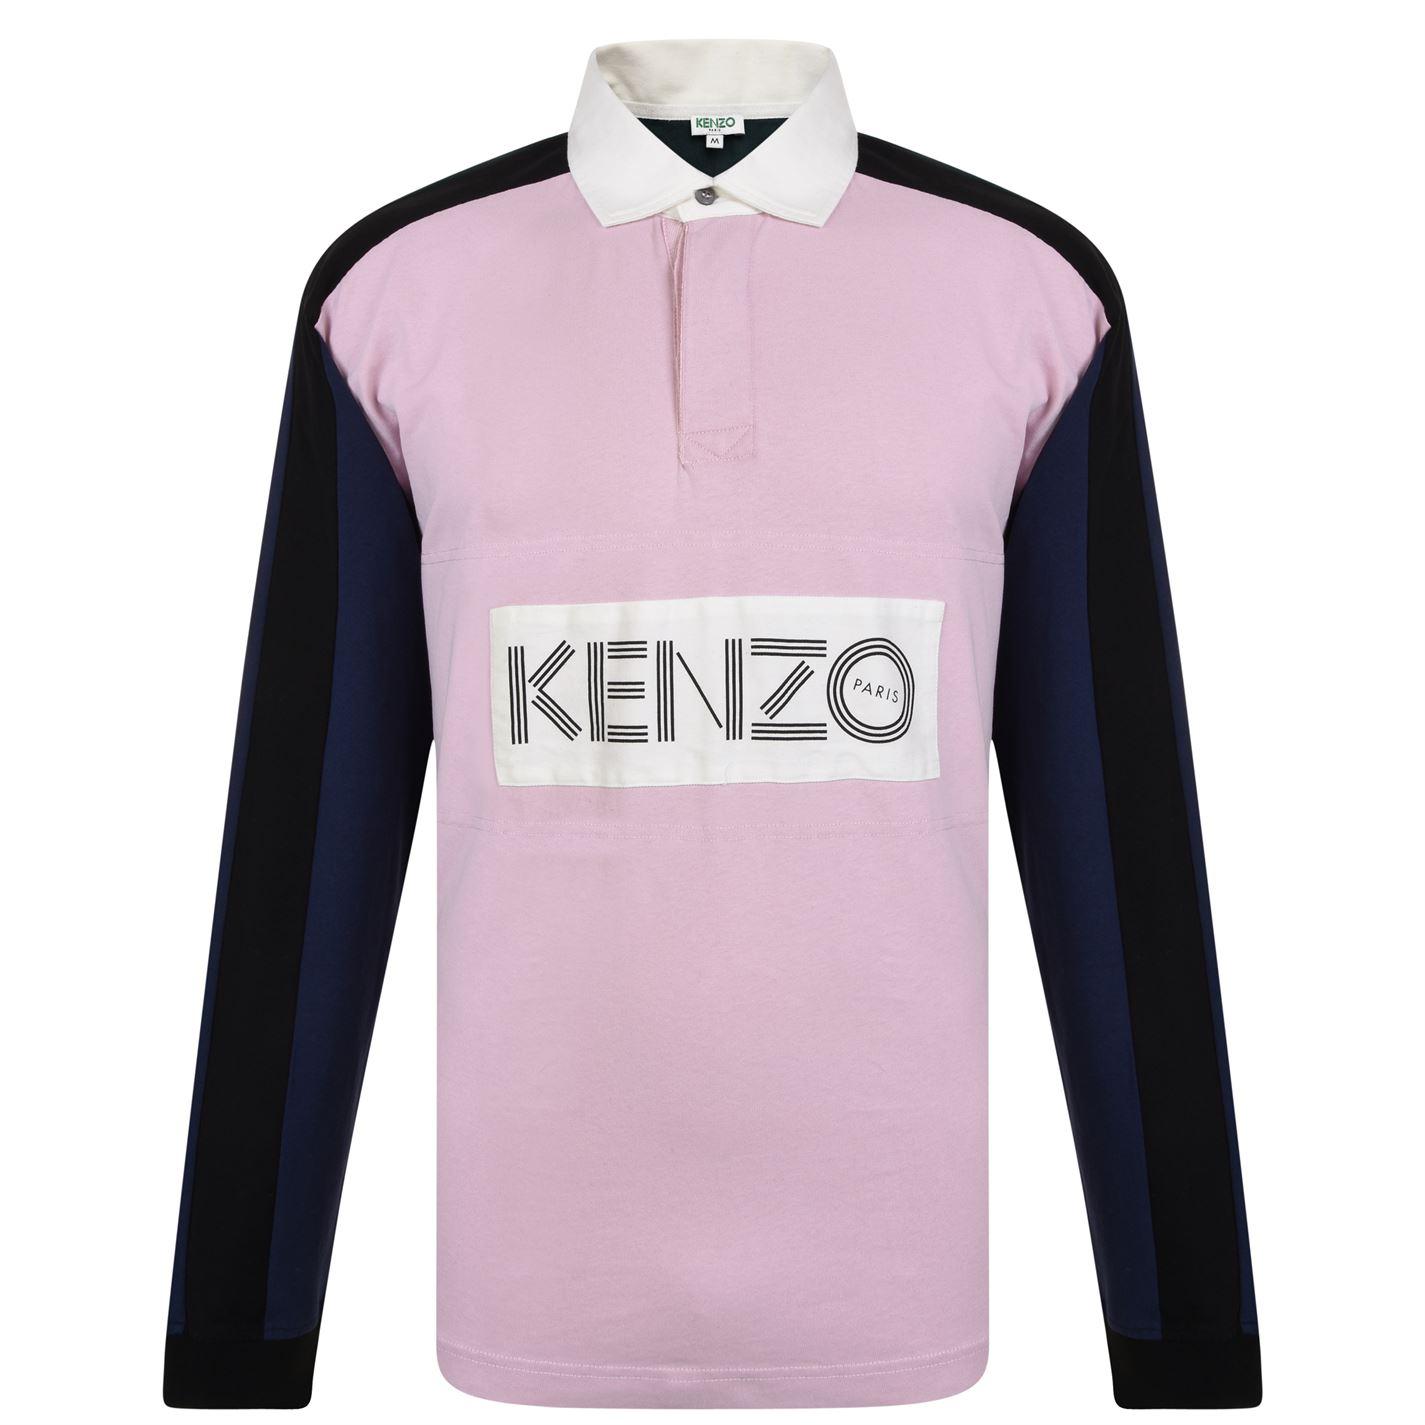 dfbedab1 Kenzo Rugby Long Sleeved Polo Shirt Pink 33 - Jeftinije.hr